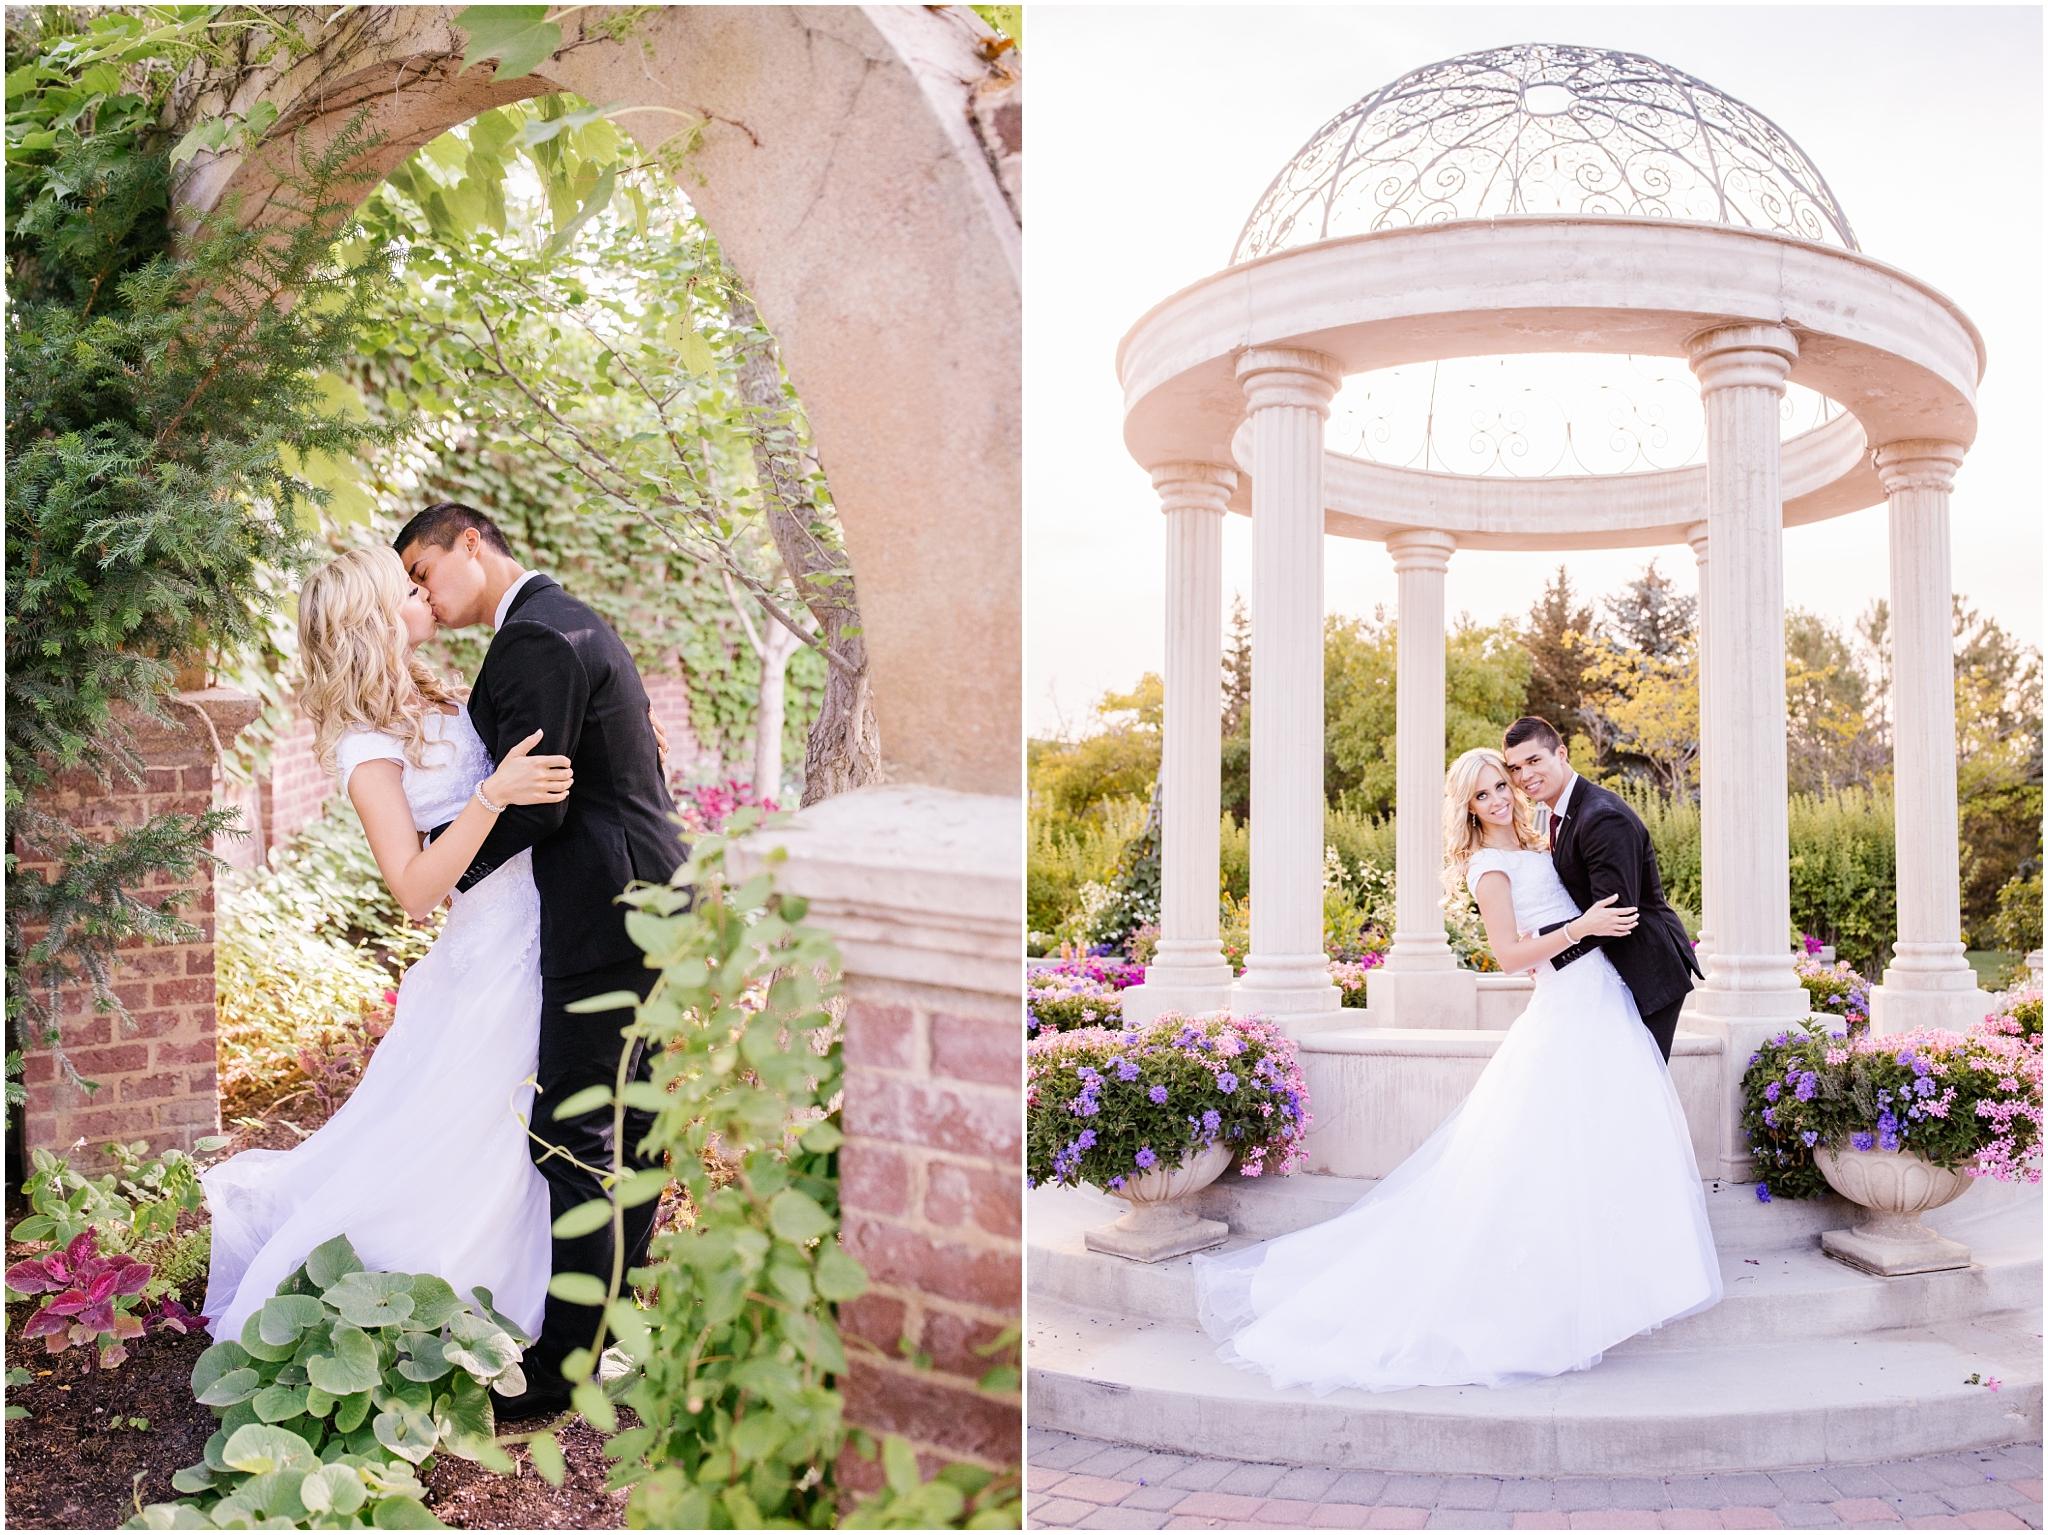 CHBridals-26_Lizzie-B-Imagery-Utah-Wedding-Photographer-Central-Utah-Park-City-Salt-Lake-City-Thanksgiving-Point-Bridals-Ashton-Gardens.jpg